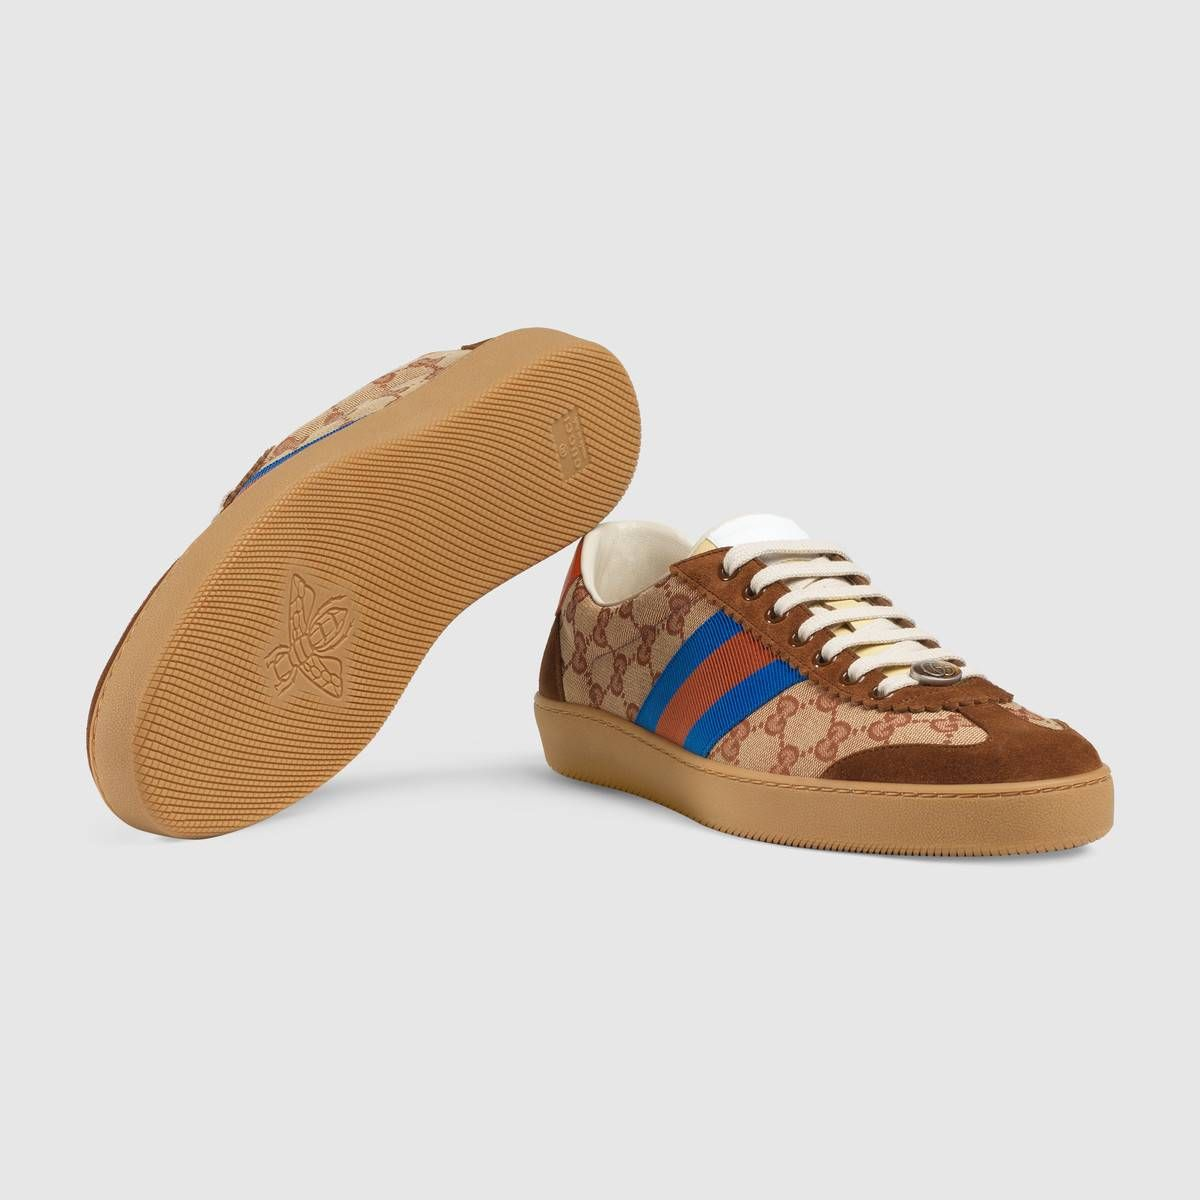 Gucci shoes. Gucci clothing. Gucci